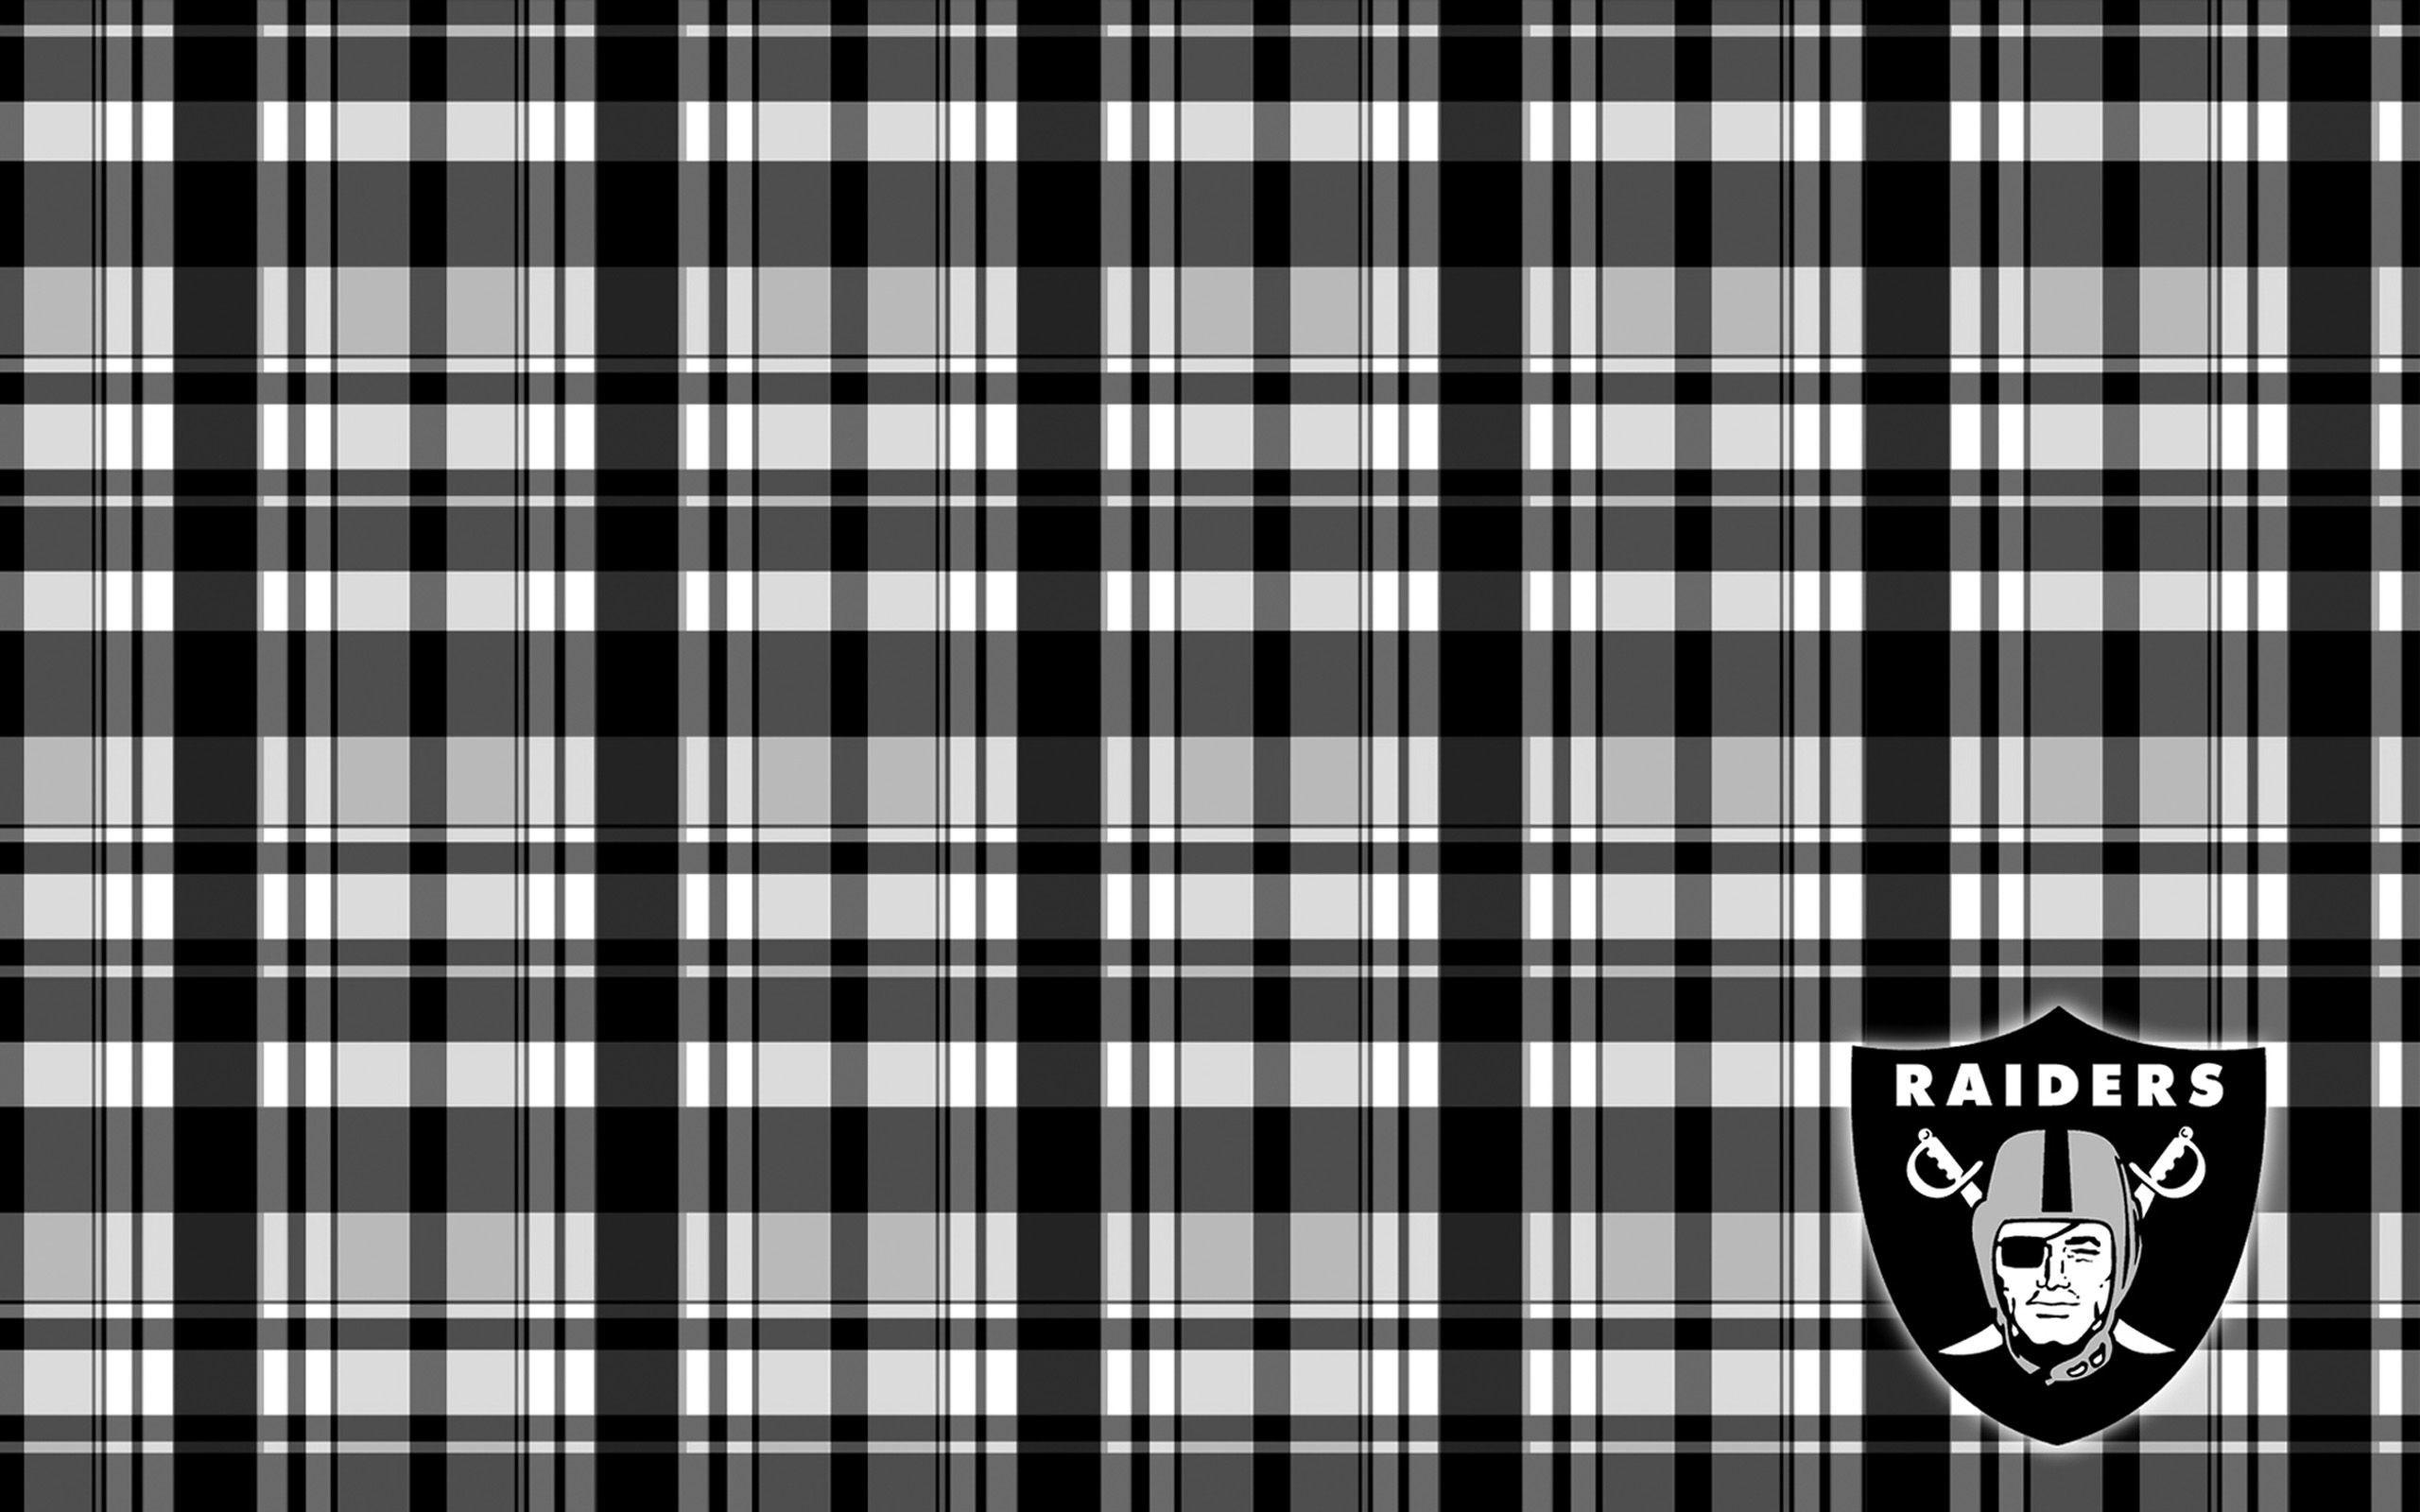 Raiders-logo-wallpapers-HD